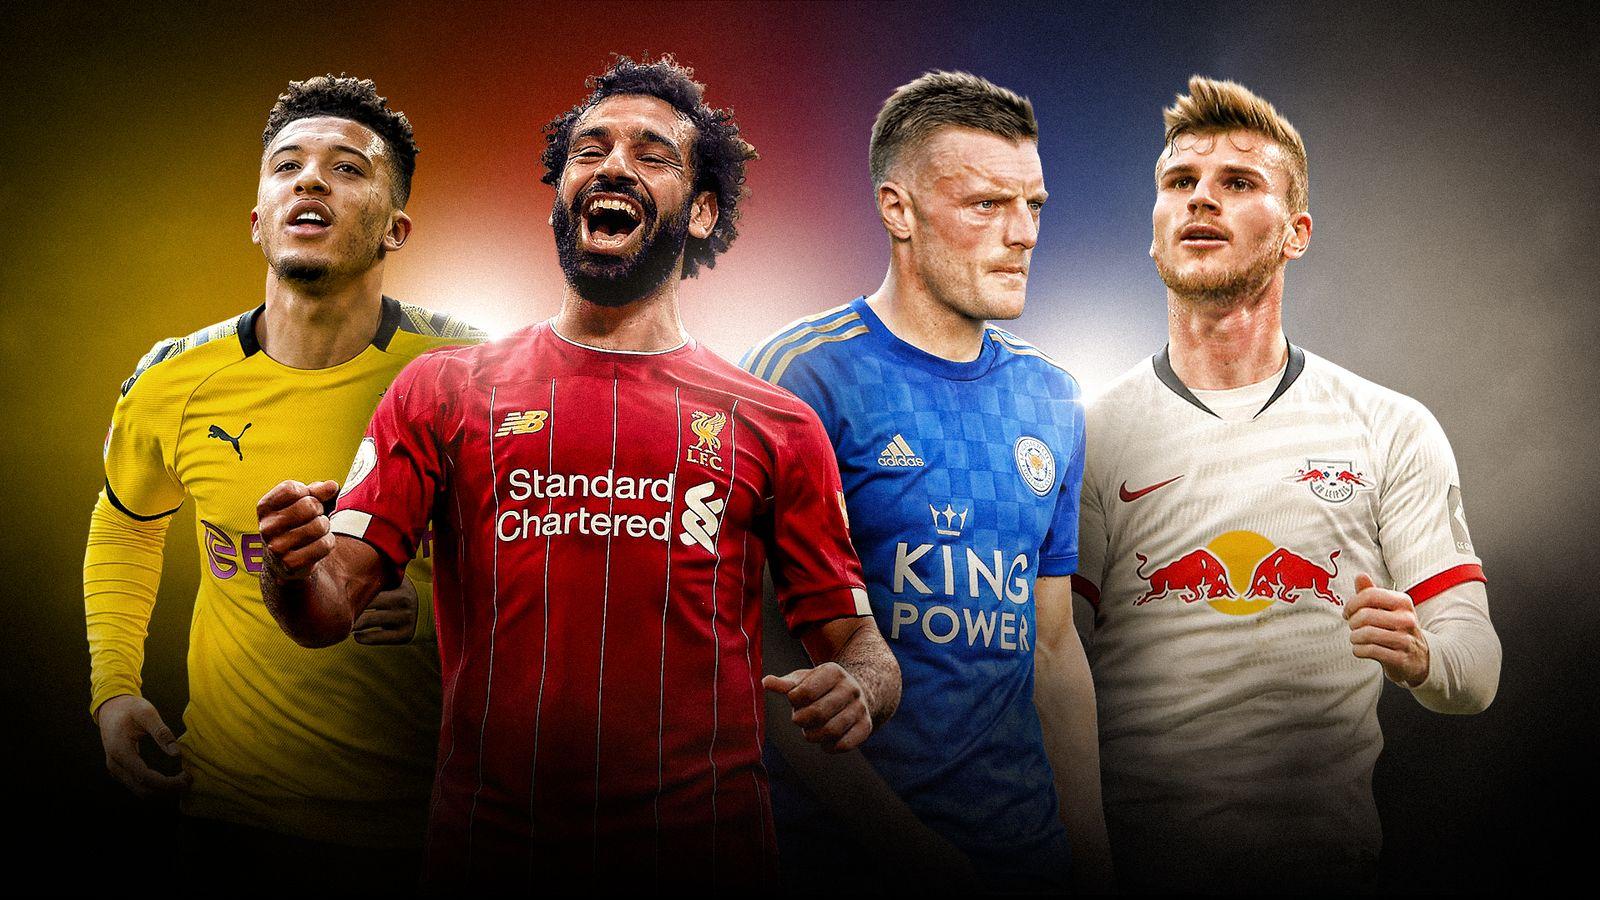 bundesliga return which club should you follow based on your premier league team football news sky sports premier league team